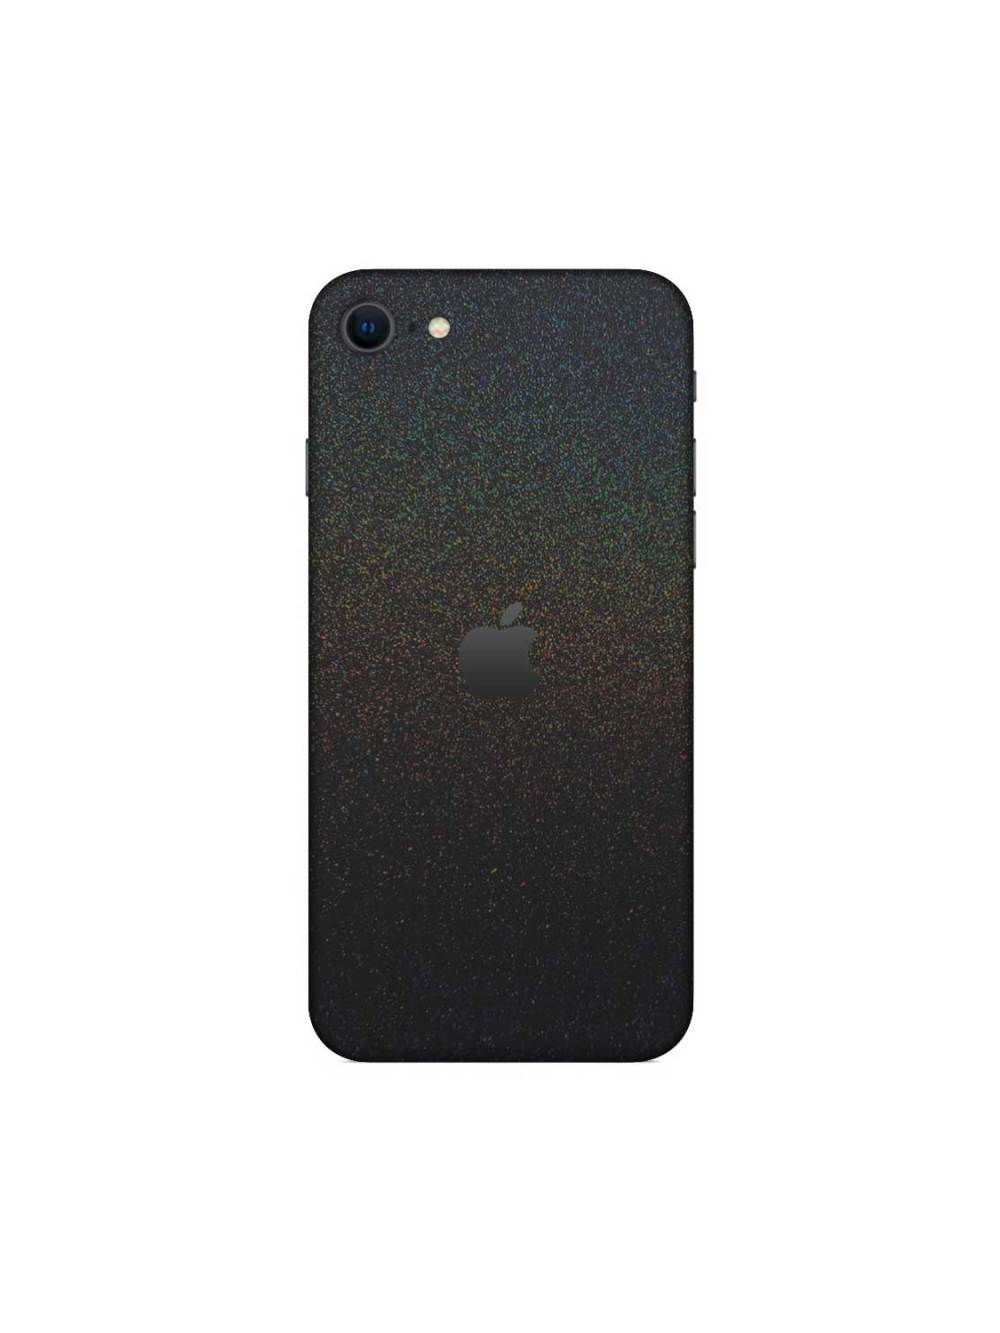 Apple iPhone SE 2020 Skin Wrap